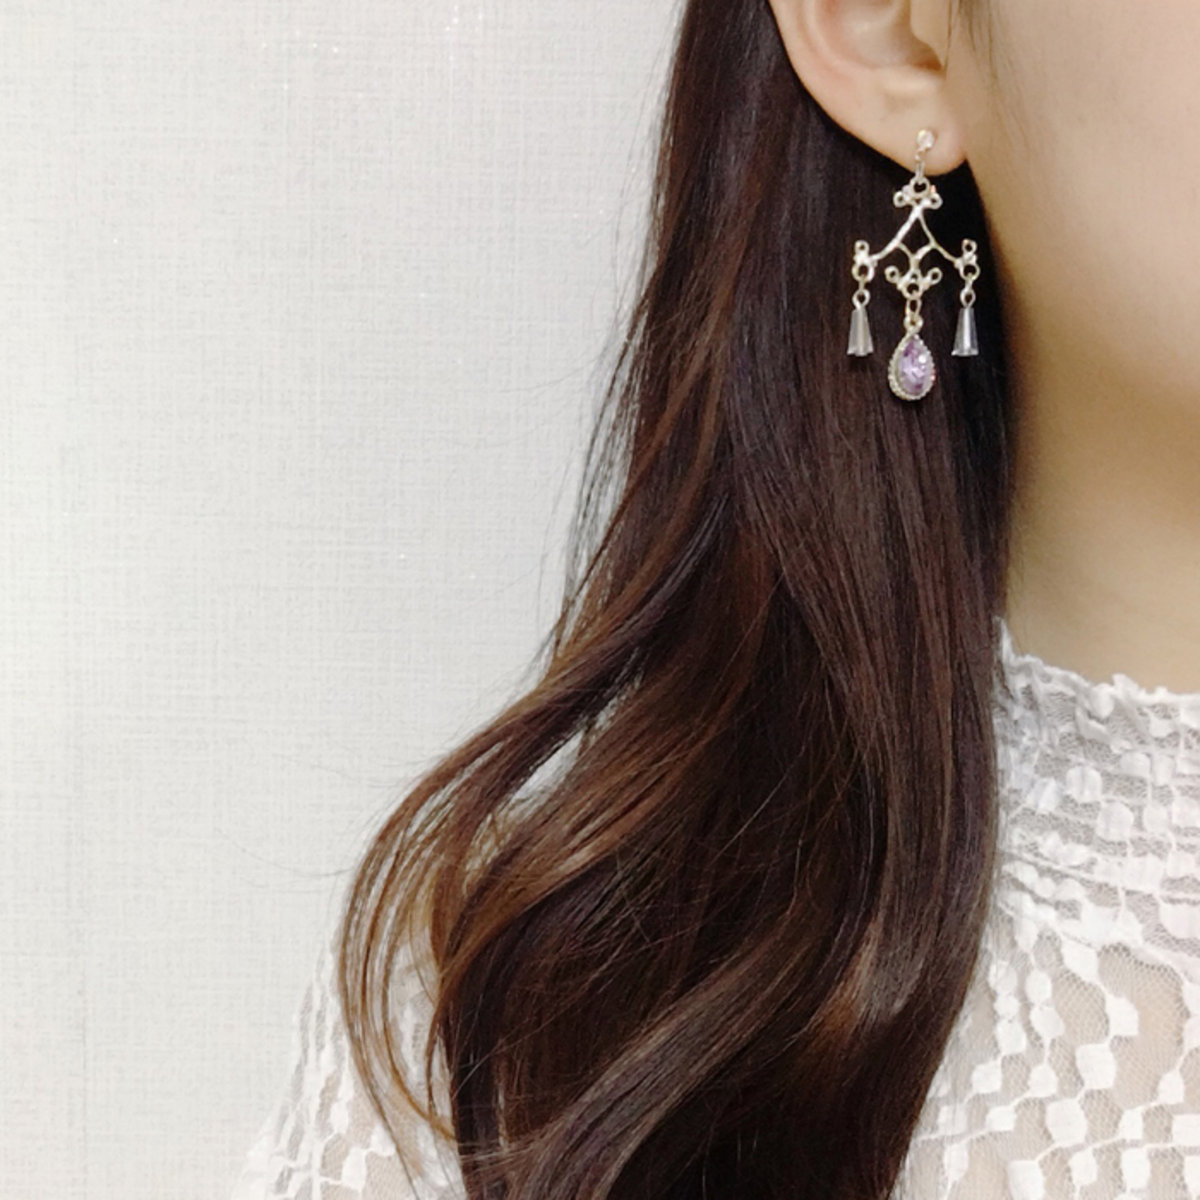 Seoul ladies blingmoon ellen chandelier earrings hktvmall online blingmoon ellen chandelier earrings arubaitofo Image collections